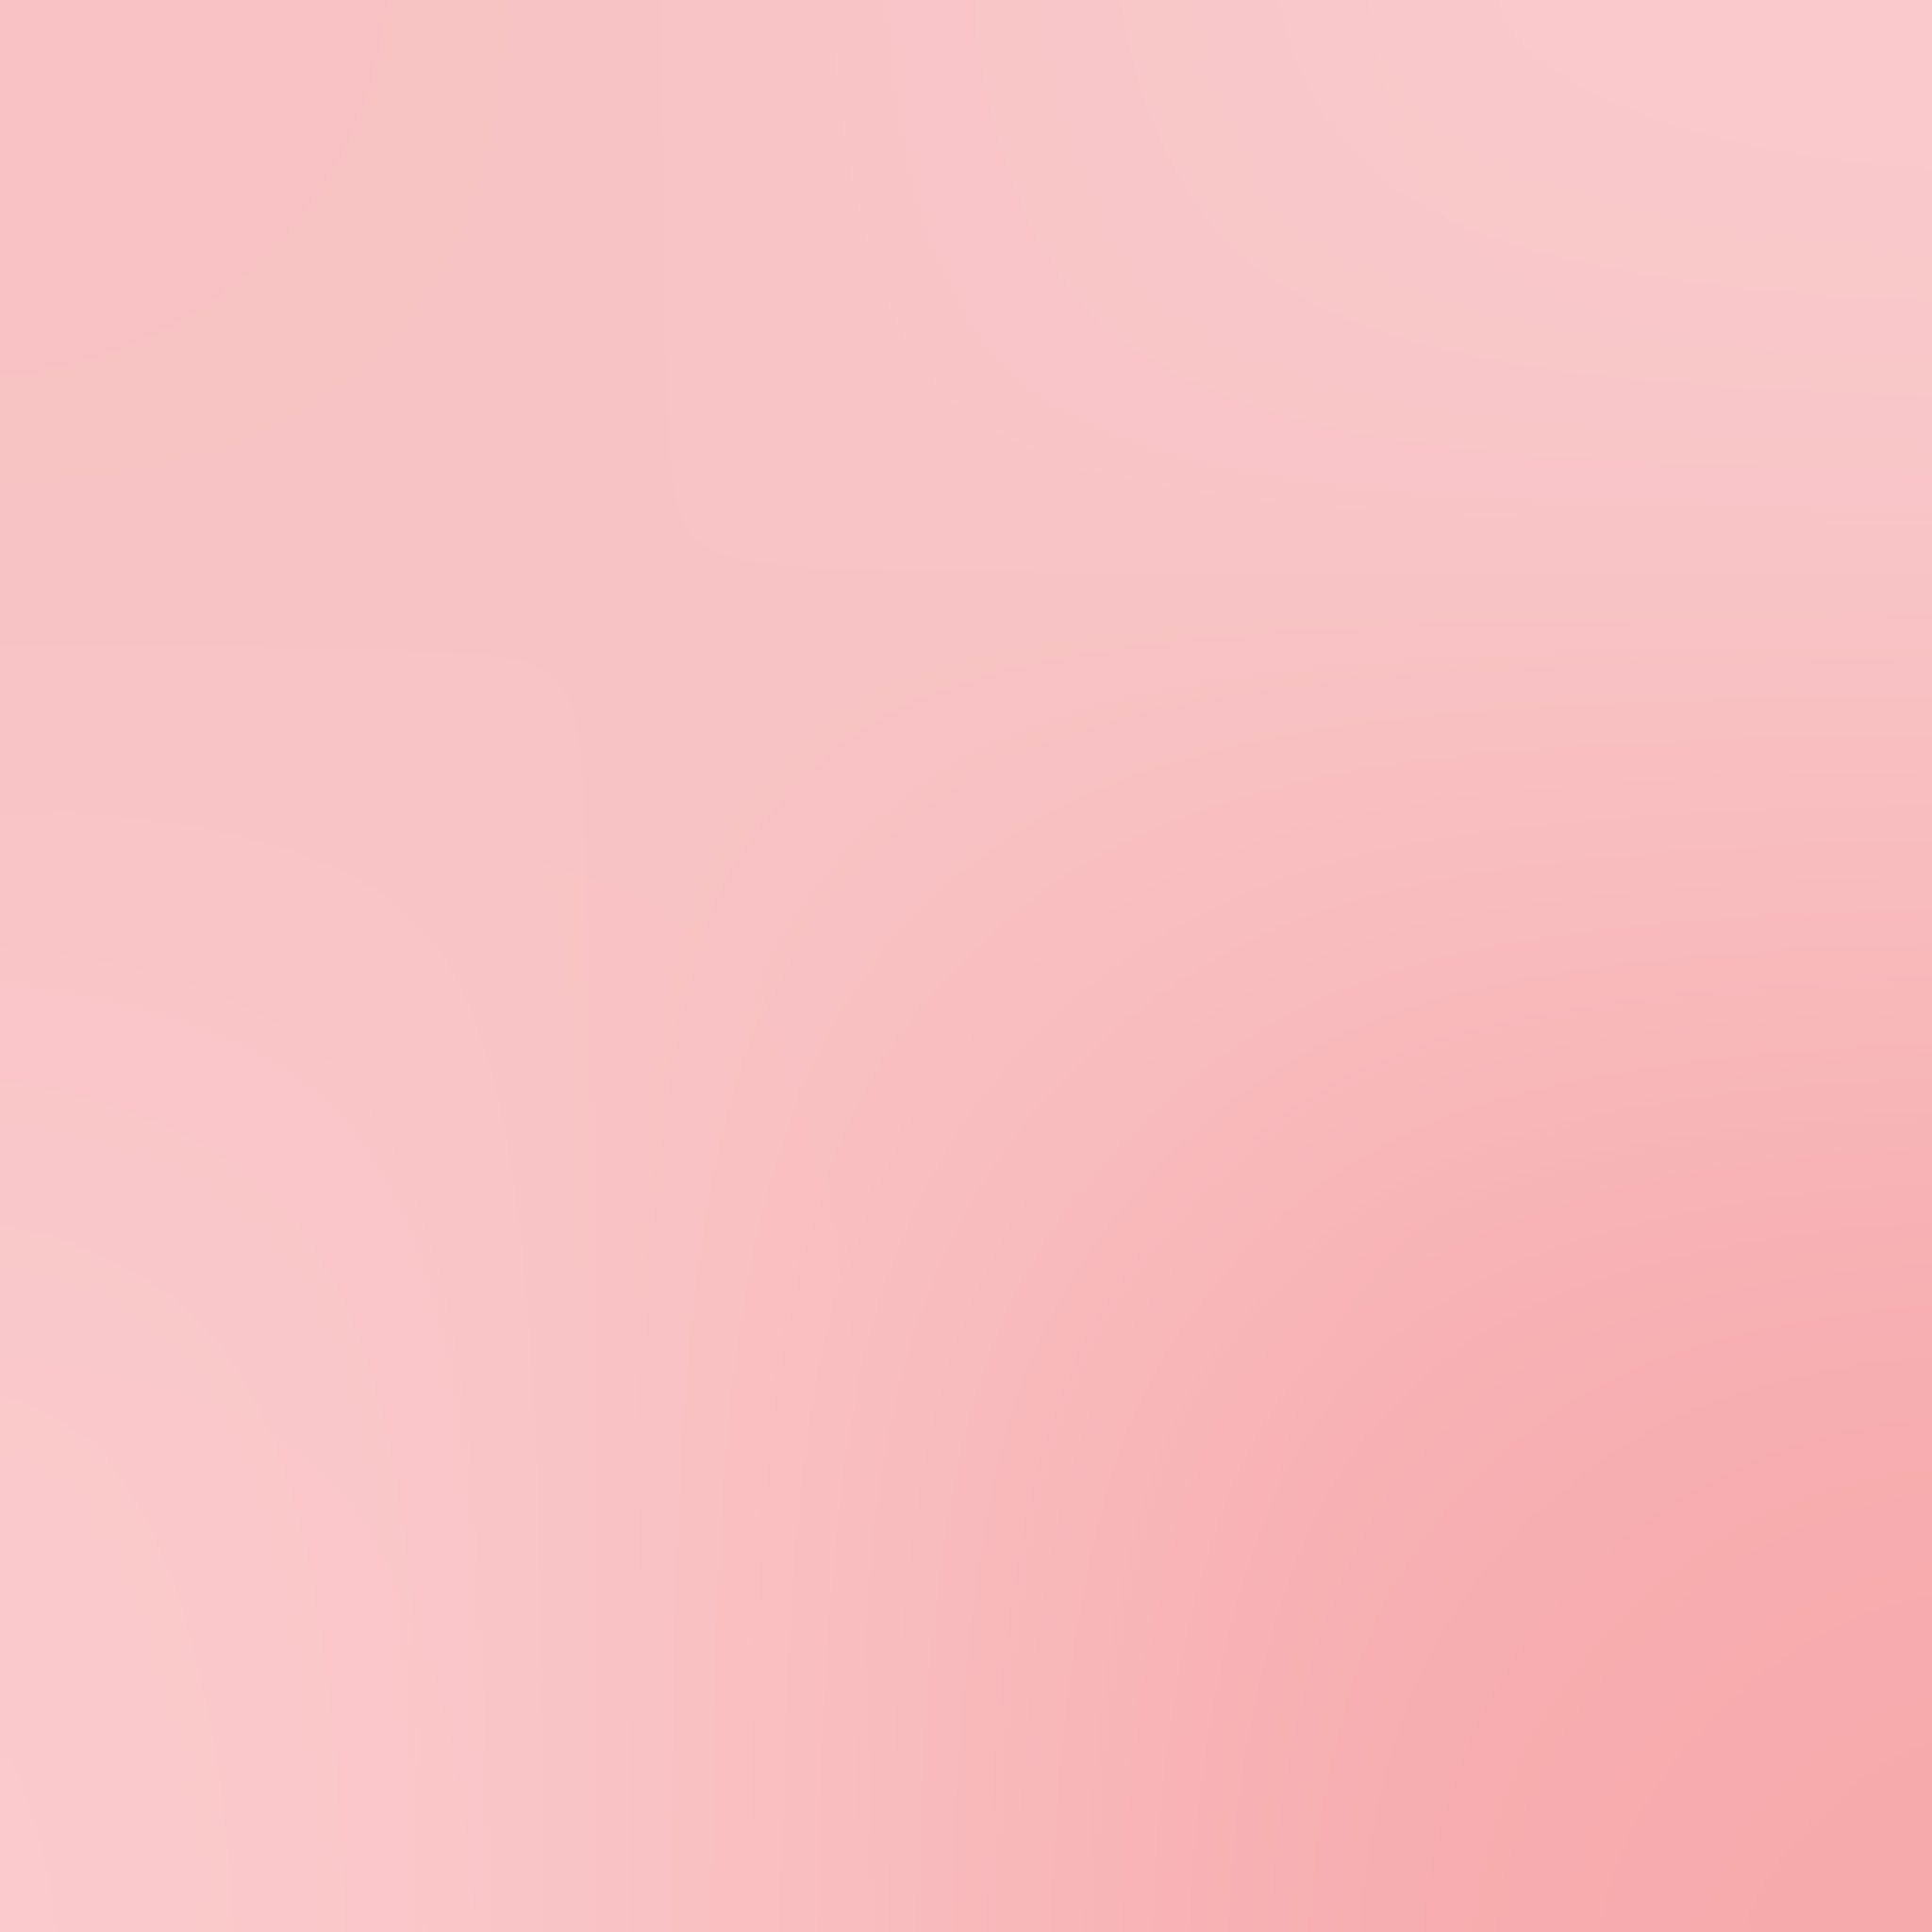 freeios8 | iphone wallpaper | sk17-baby-pink-solid-blur-gradation